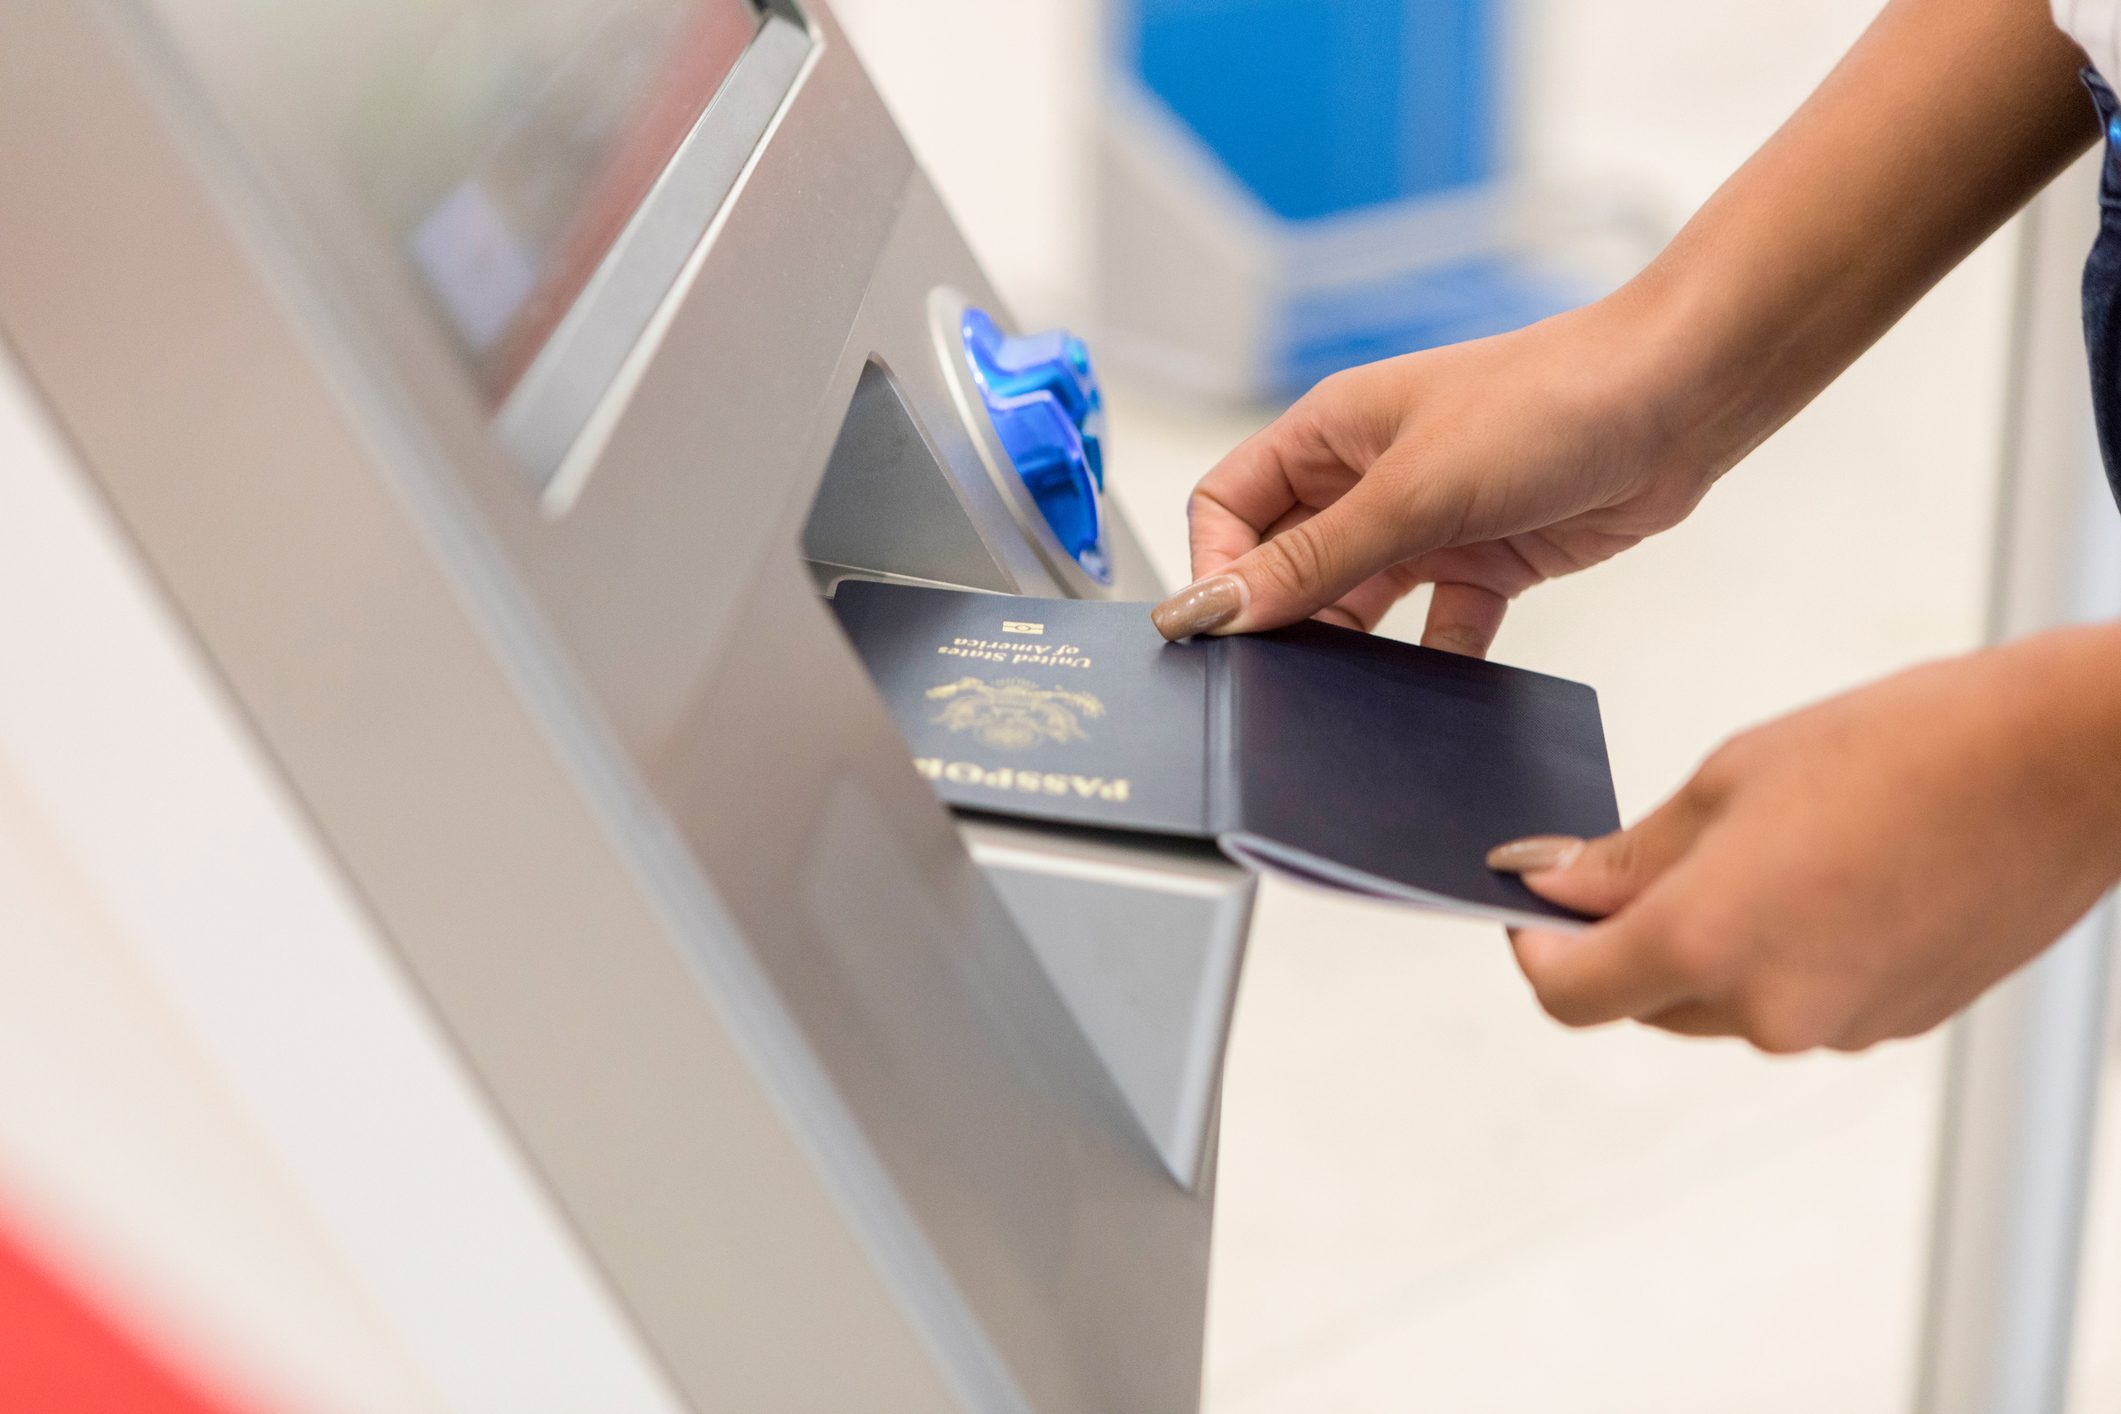 Unrecognizable woman scans passport at airport kiosk